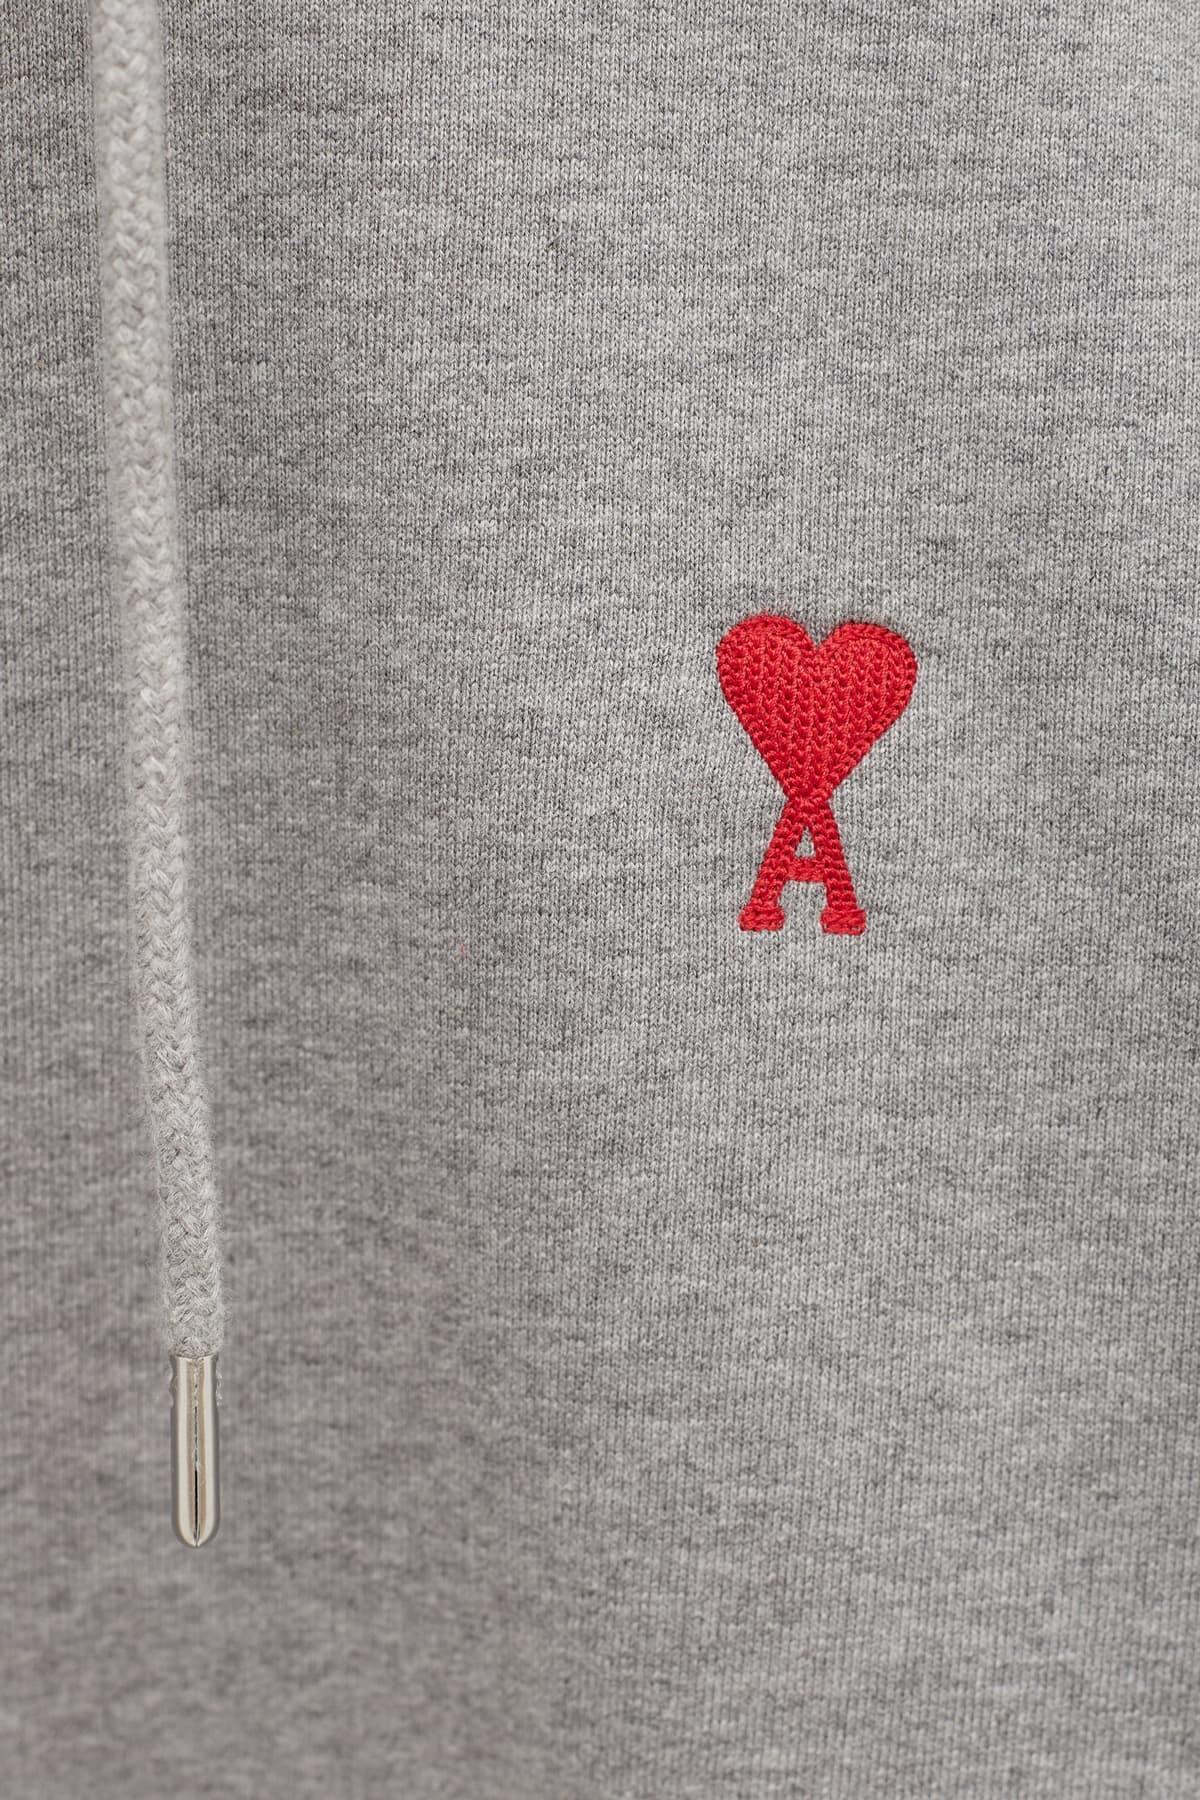 Comprar Sunnei Caramel Hooded Sweatshirt